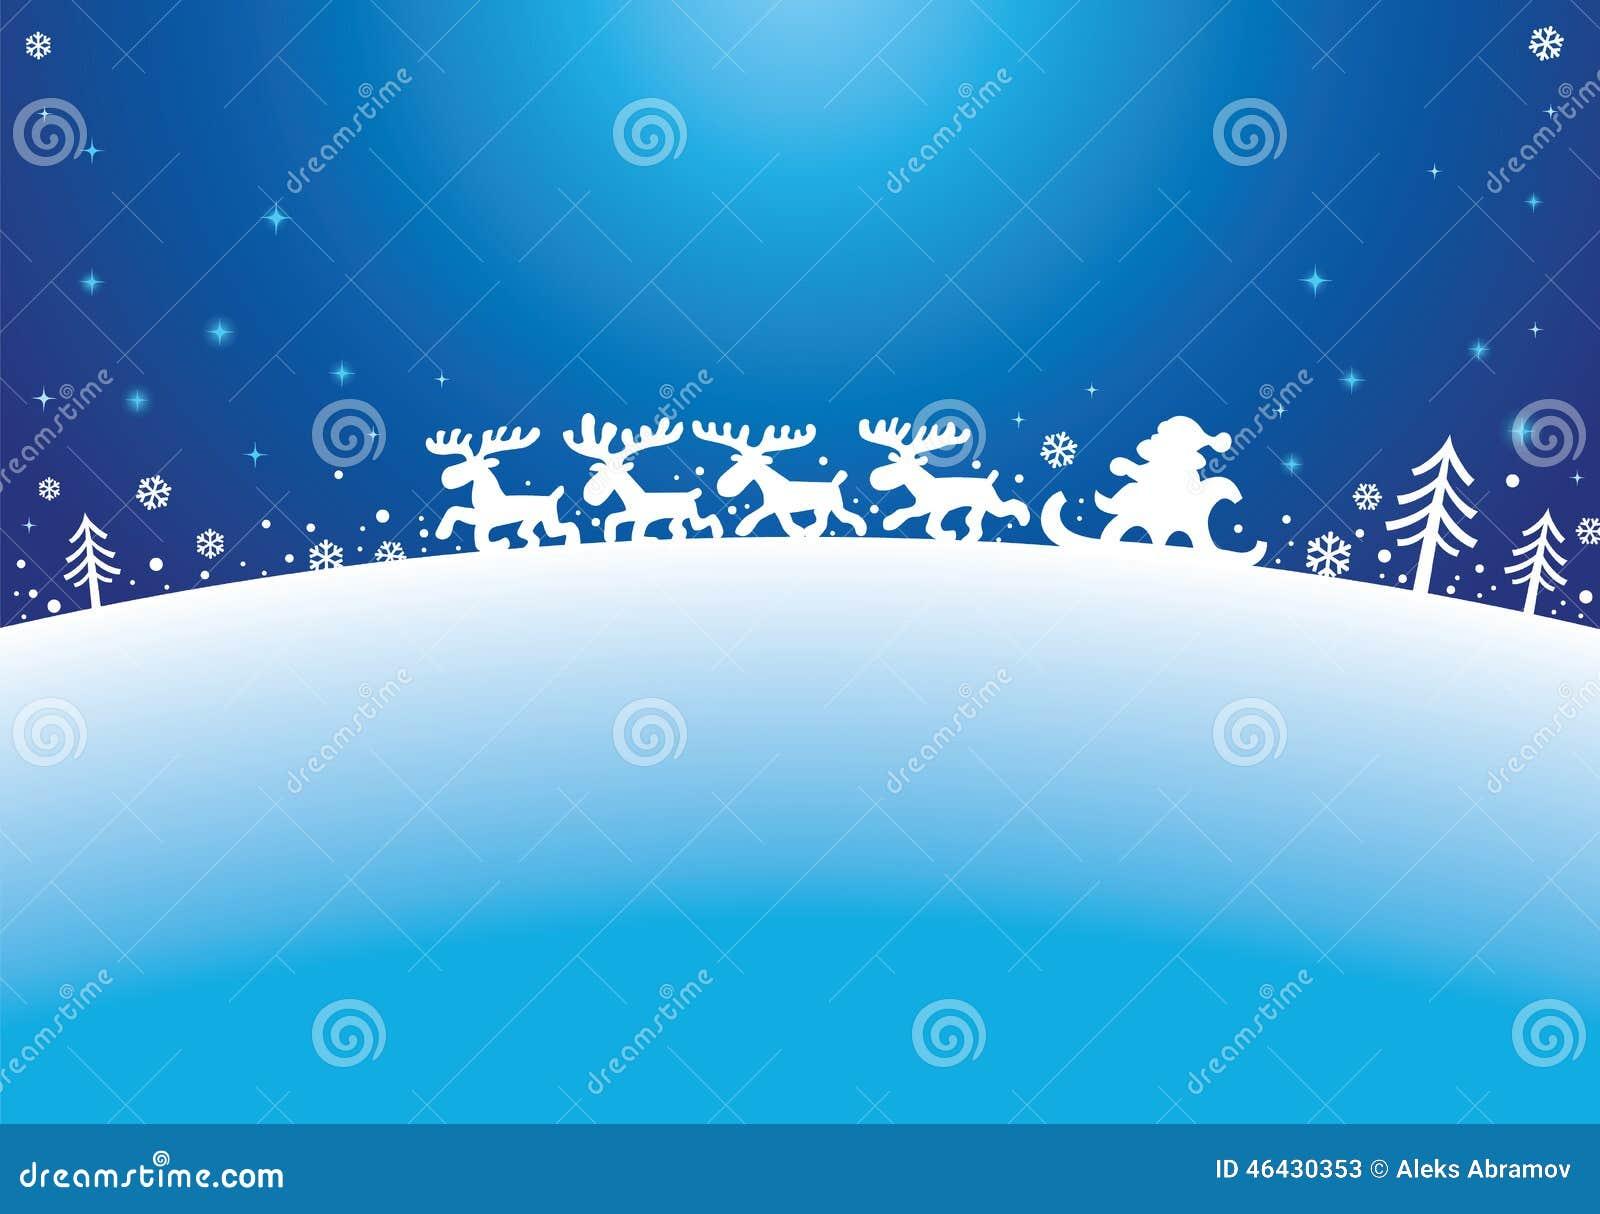 Santa And Reindeers Stock Vector - Image: 46430353